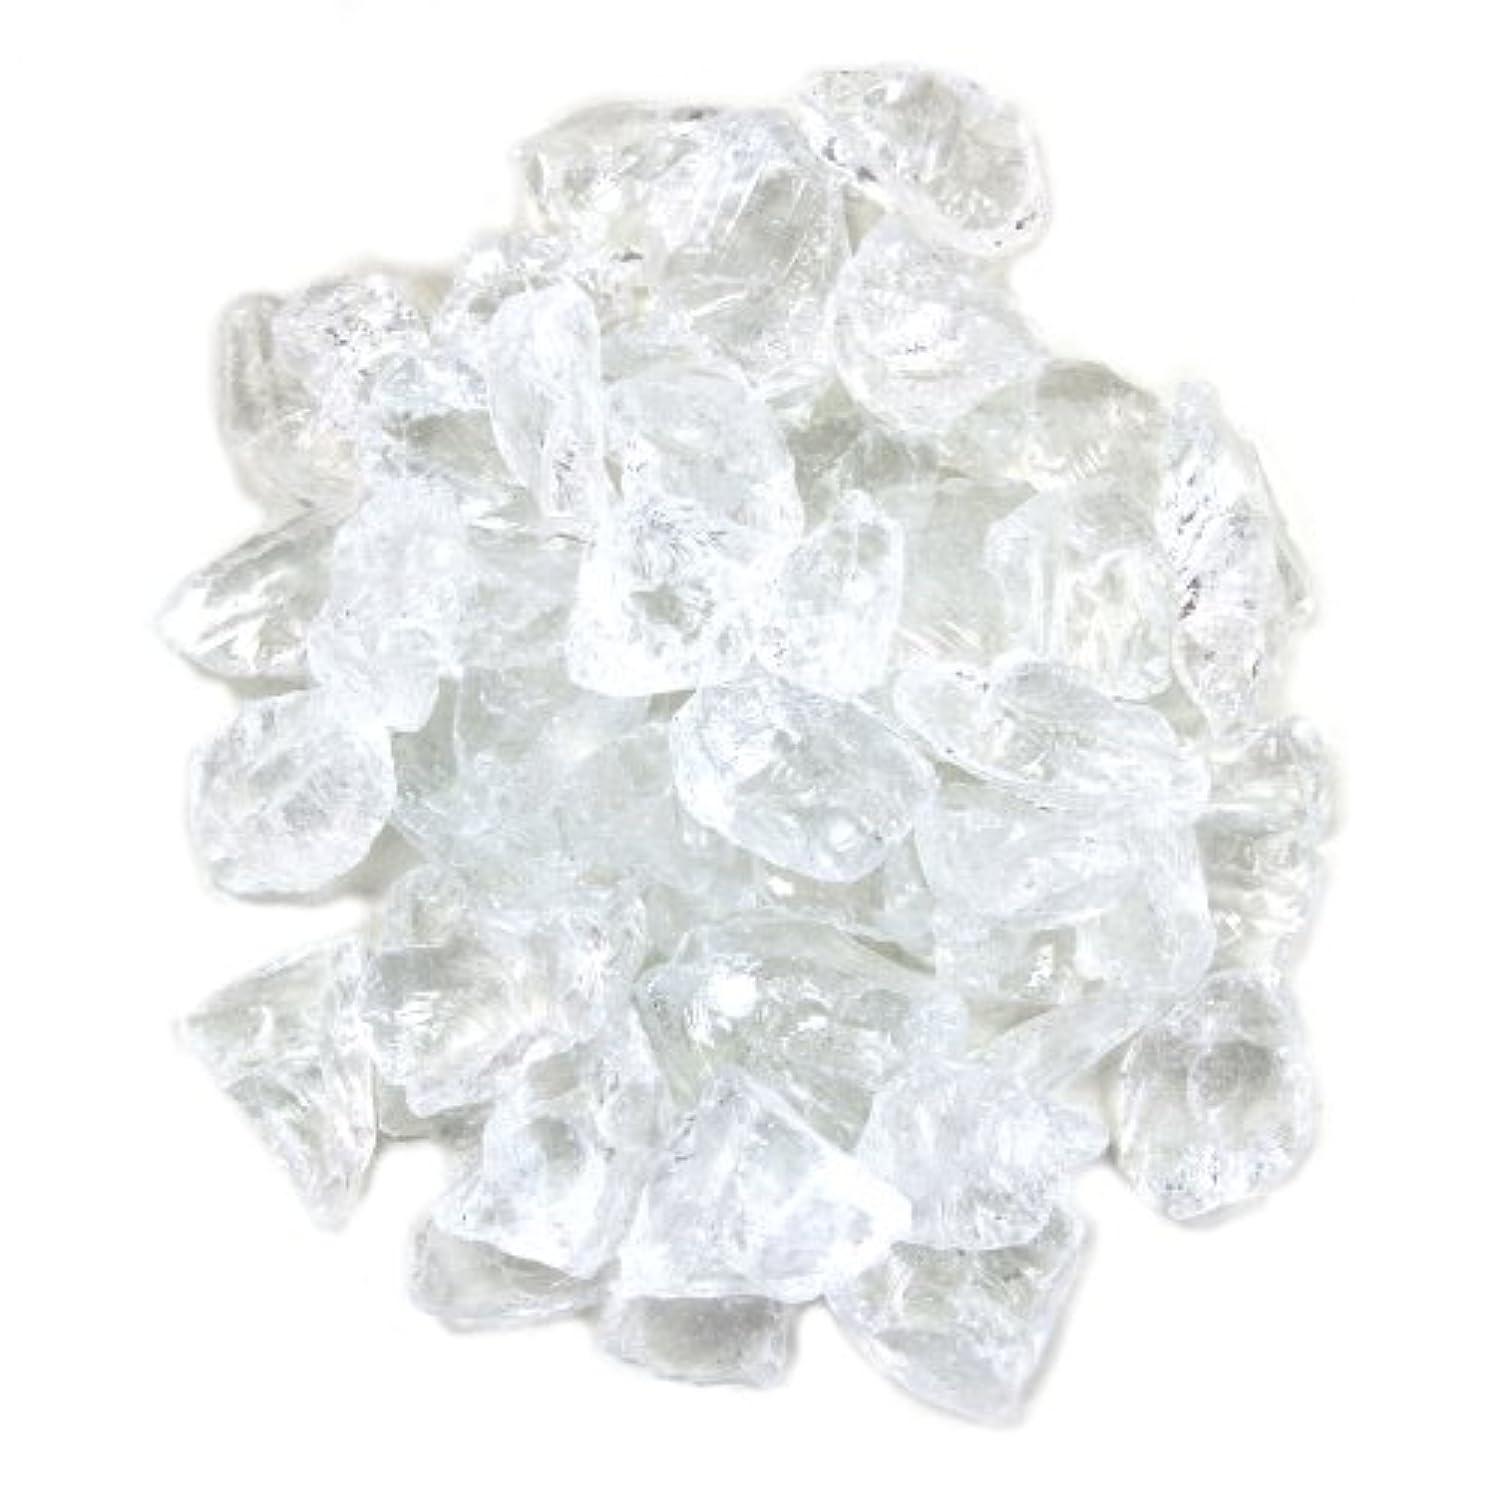 Koyal Wholesale Centerpiece Vase Filler Decorative Crushed Glass, 4.5-Pound, Clear